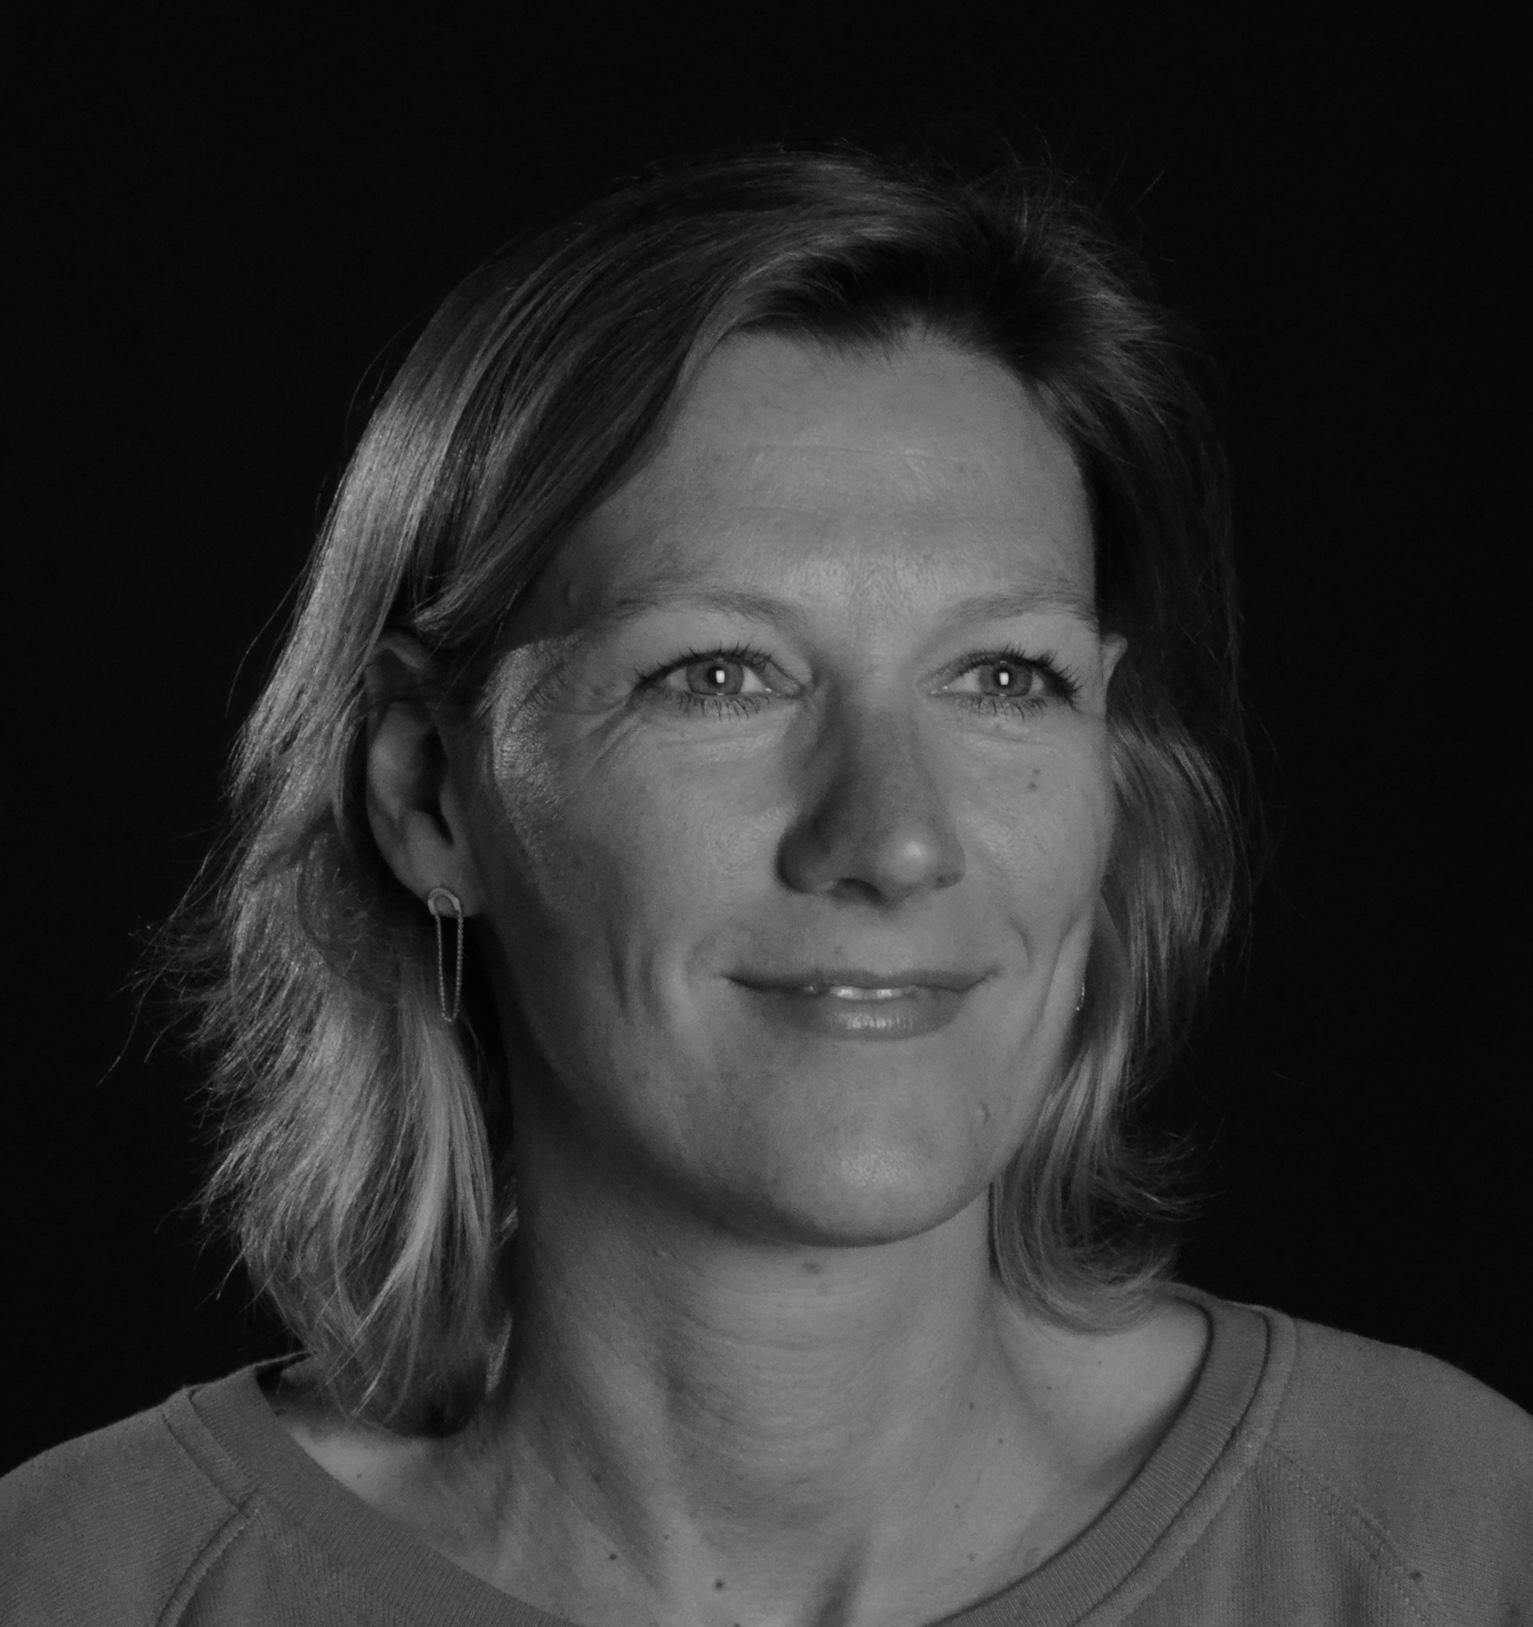 Erica van Stipdonk